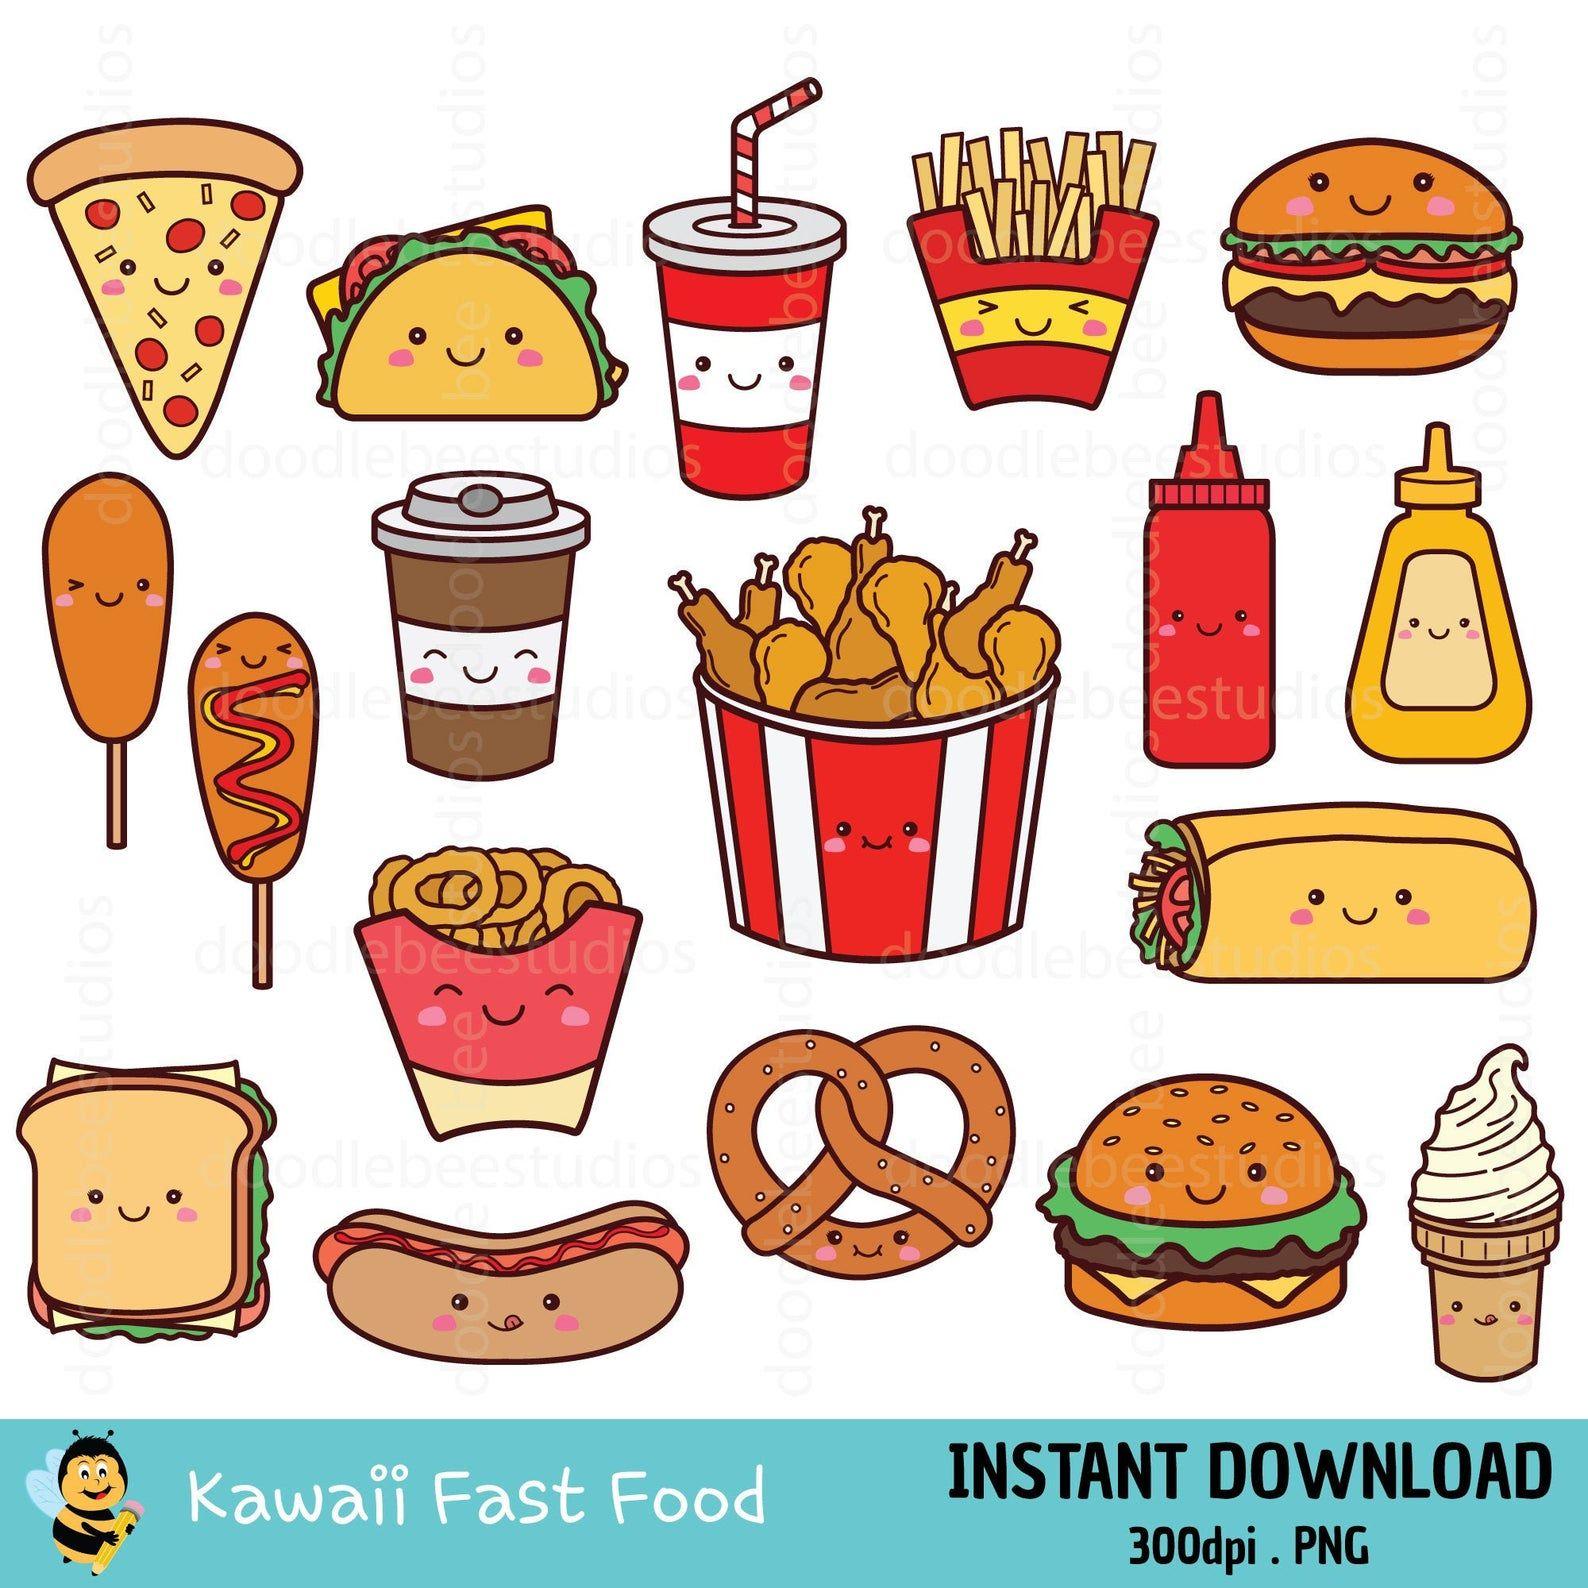 Kawaii Fast Food Clipart Fast Food Clipart Fast Food Clip Art Cute Fast Food Clipart Fast Food Icons Kawaii Fast Food Icons Food Clipart Clip Art Food Clips